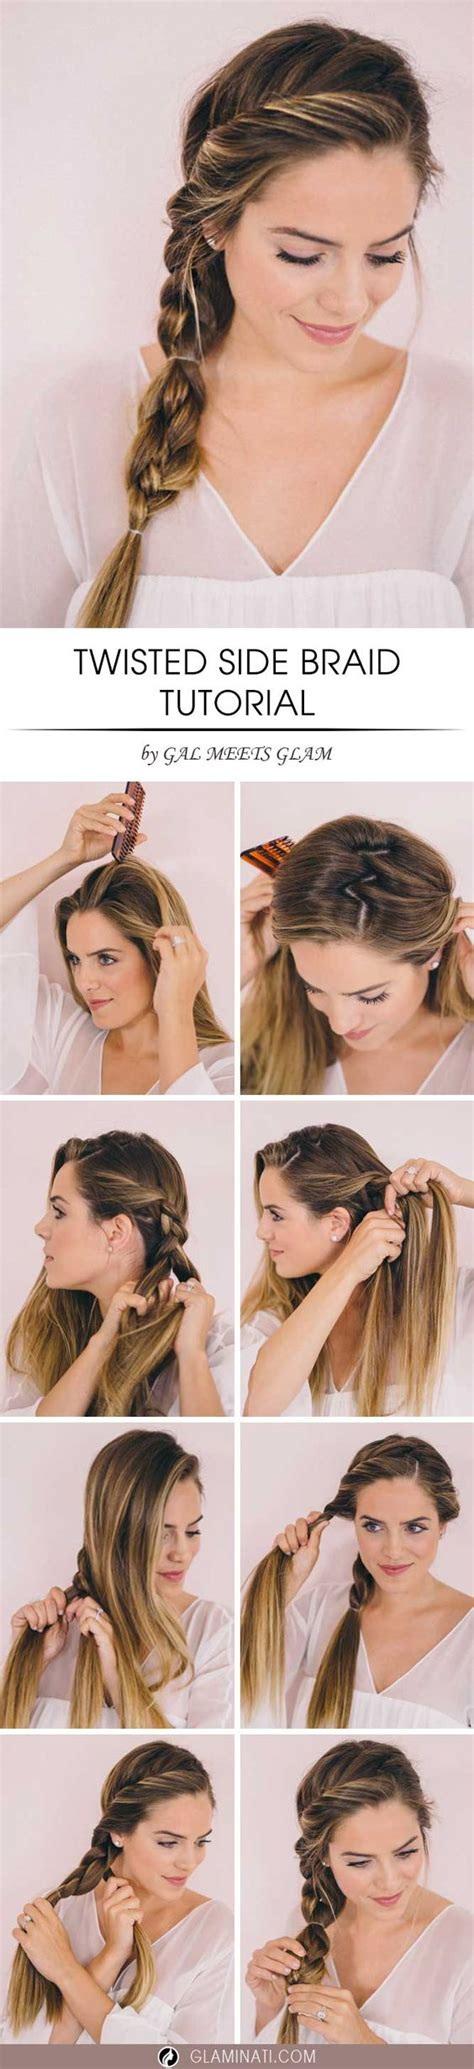 tutorial mengepang rambut 23 model kepang rambut panjang dan pendek terbaik 2017